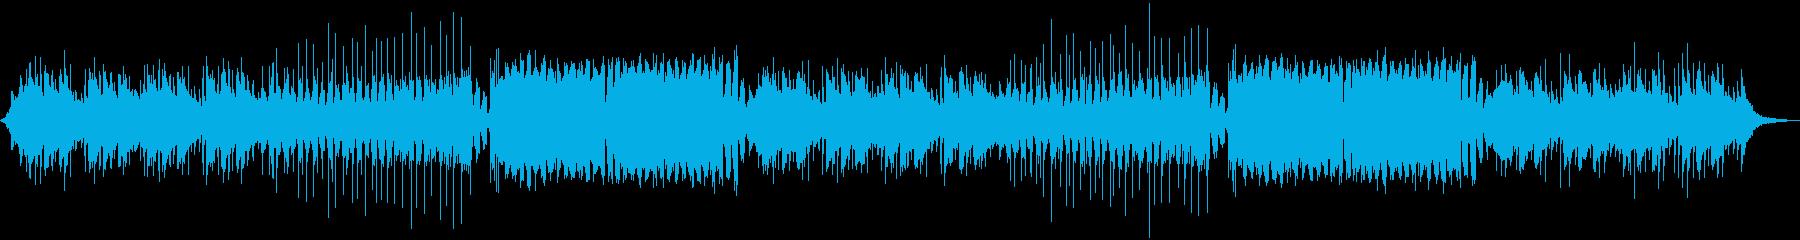 EDM・明るい・爽やか・パワフルの再生済みの波形